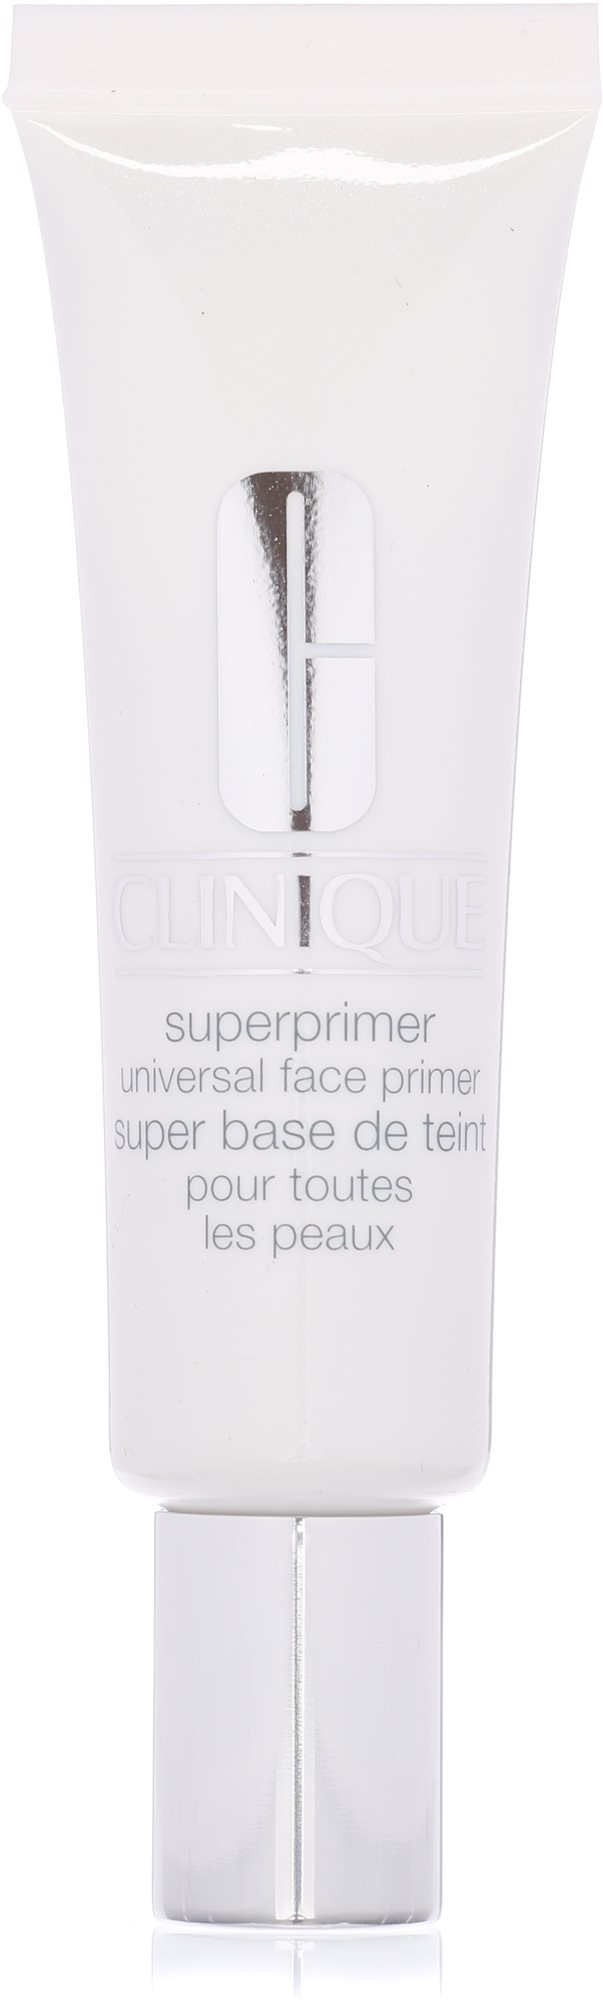 CLINIQUE Superprimer Universal Face Primer 30 ml